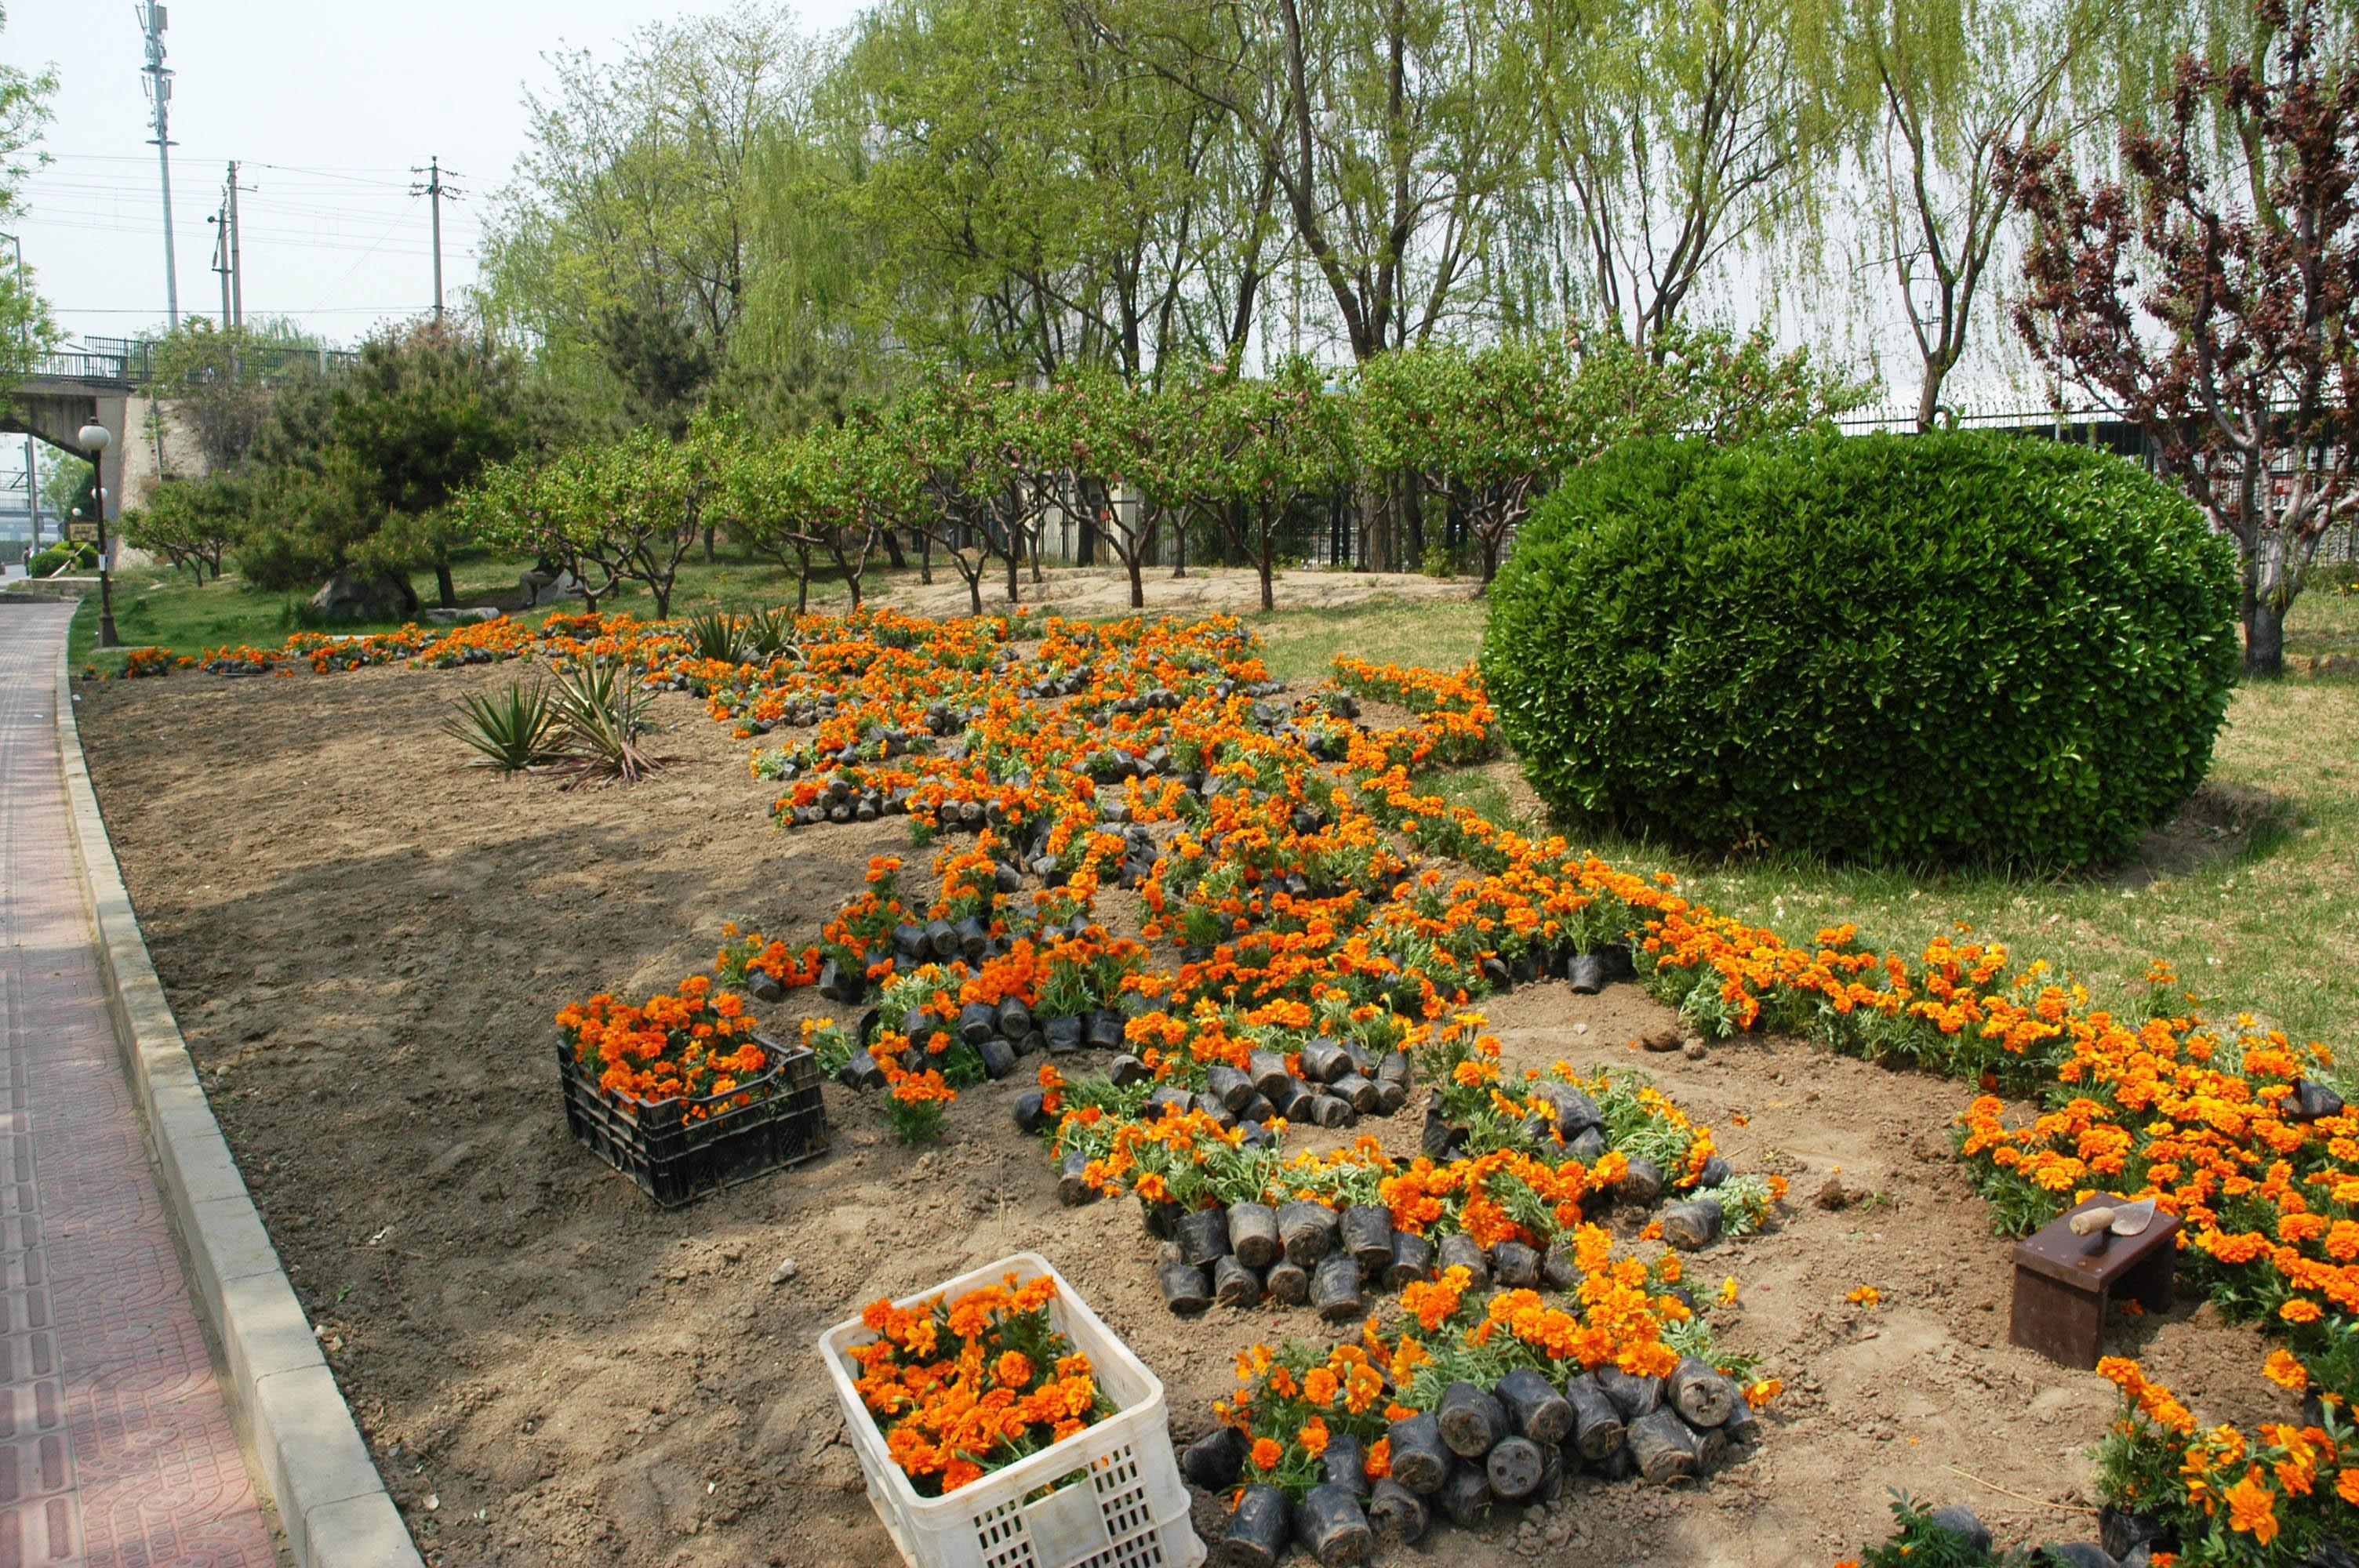 Free Images : tree, plant, lawn, backyard, soil, botany, flowers ...